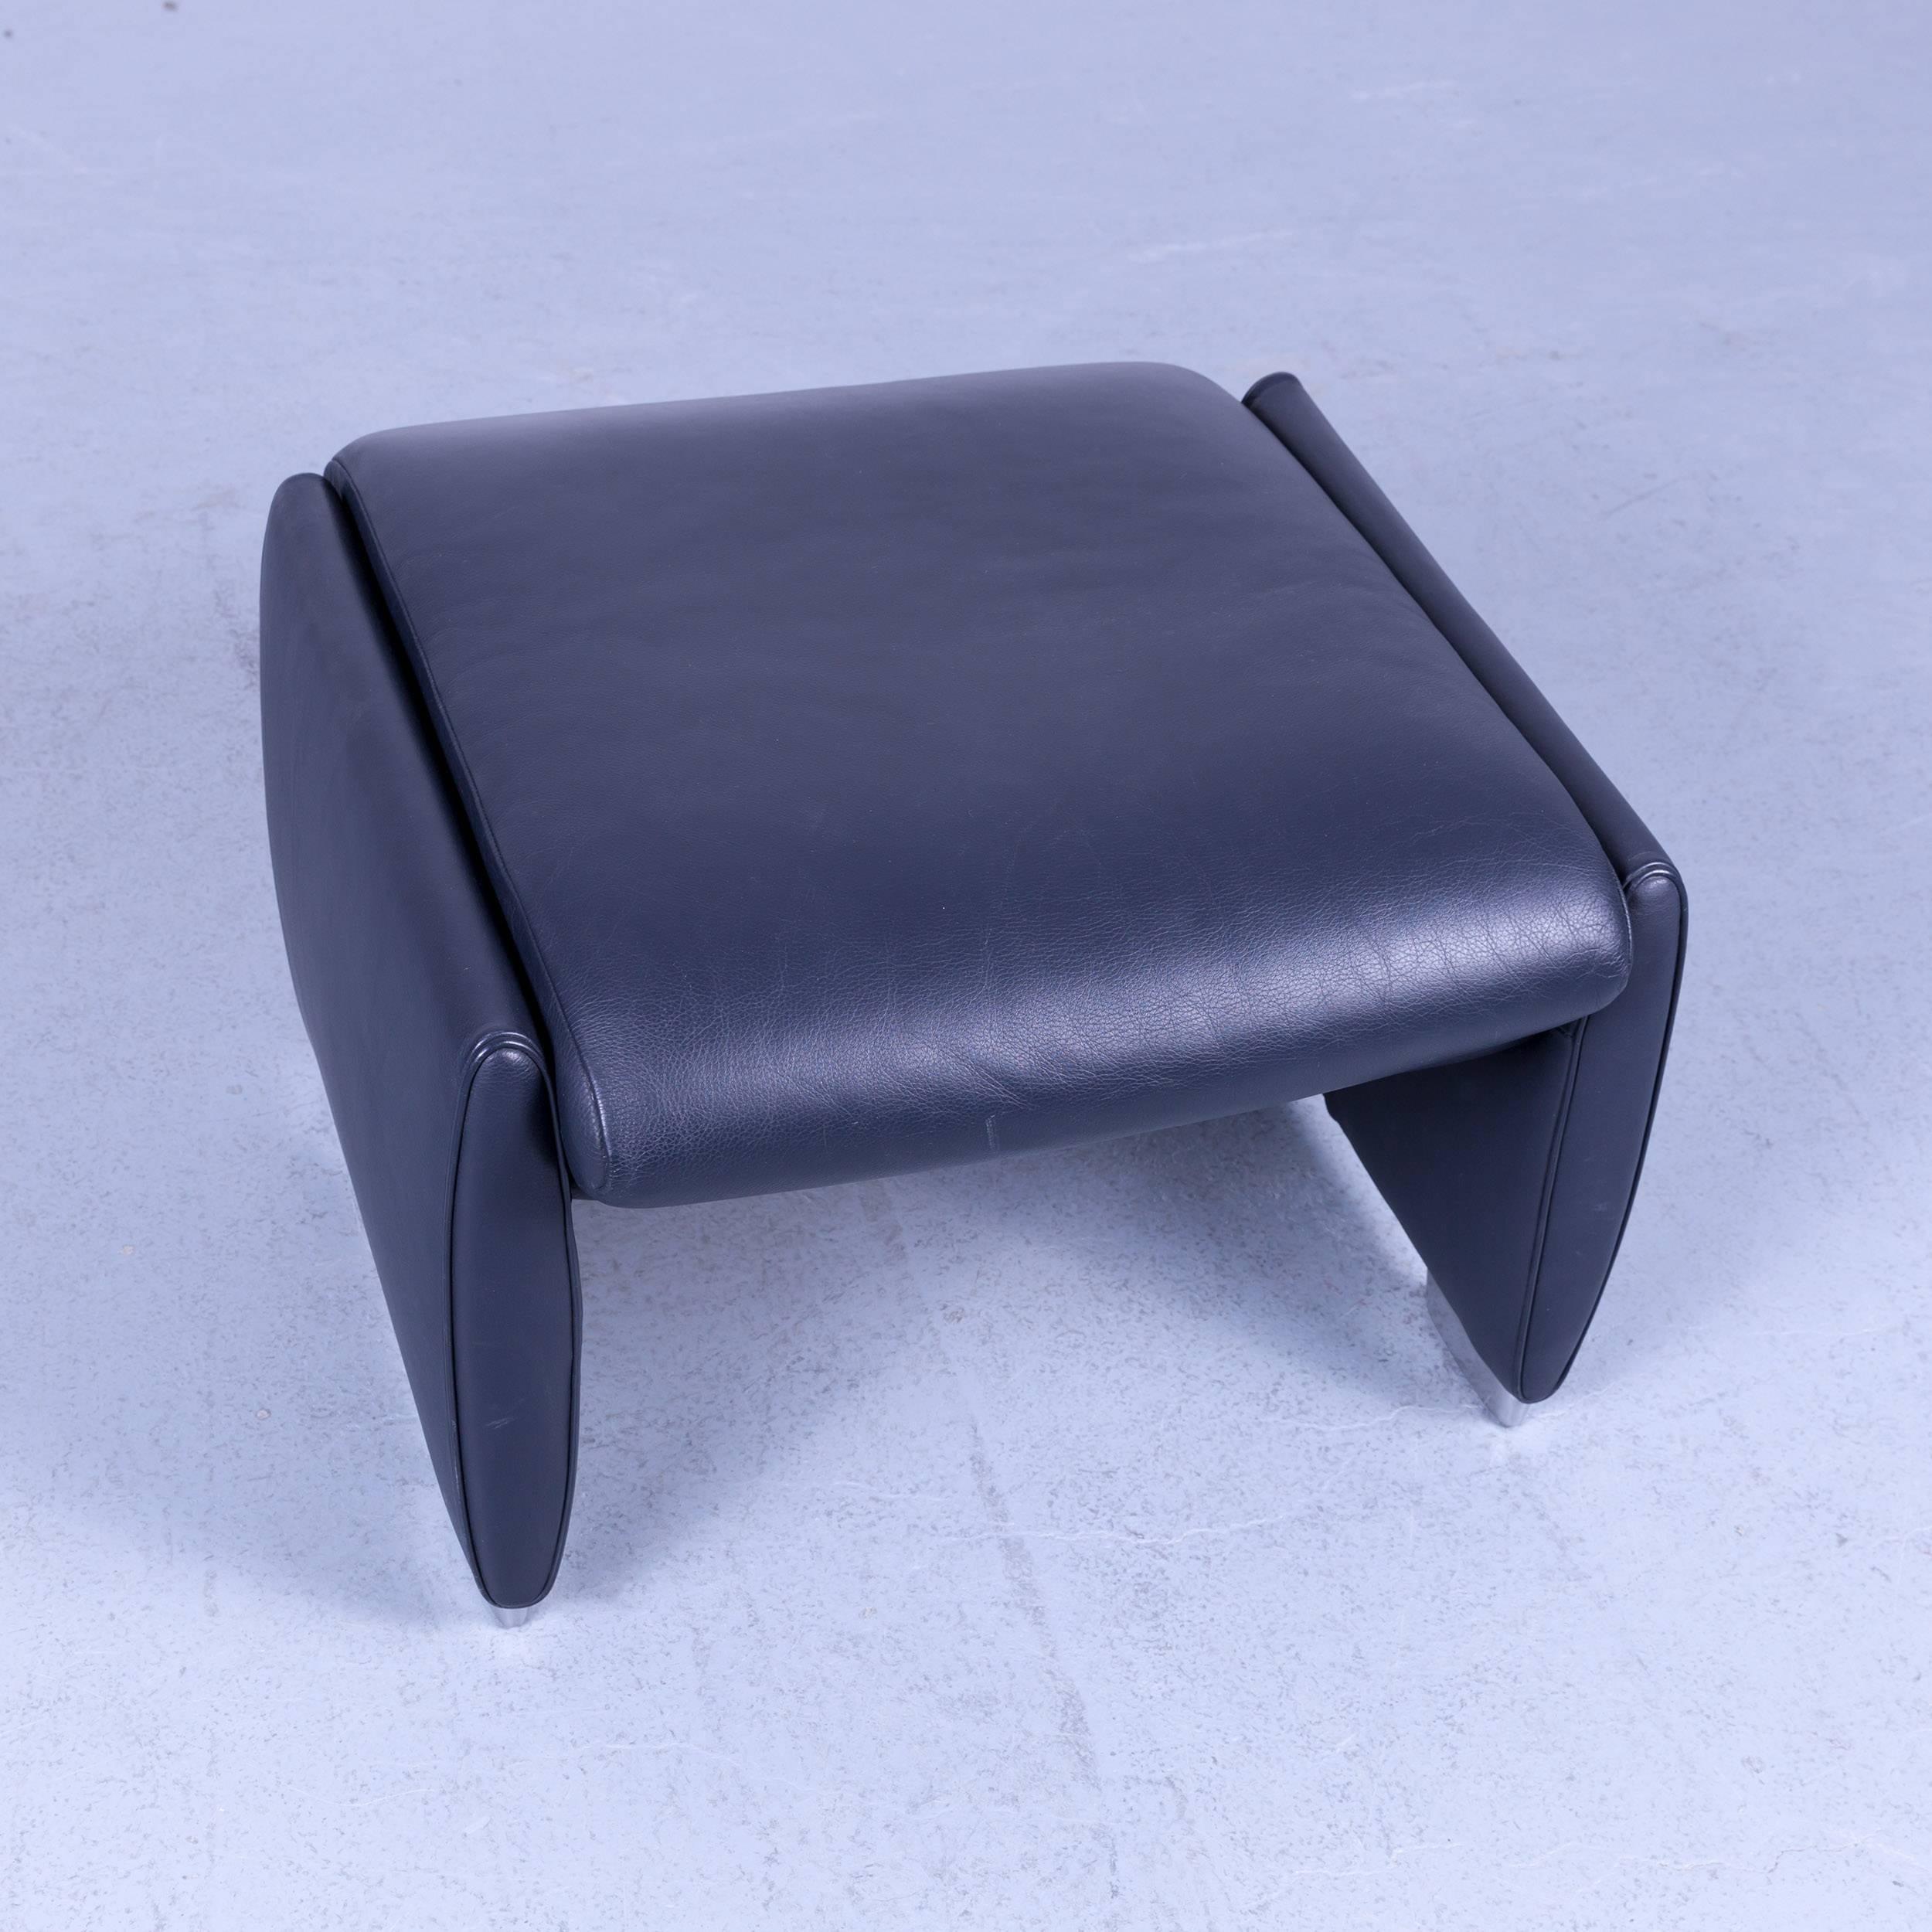 Marvelous De Sede Ds 10 Designer Leather Footstool Dark Navy Blue Theyellowbook Wood Chair Design Ideas Theyellowbookinfo